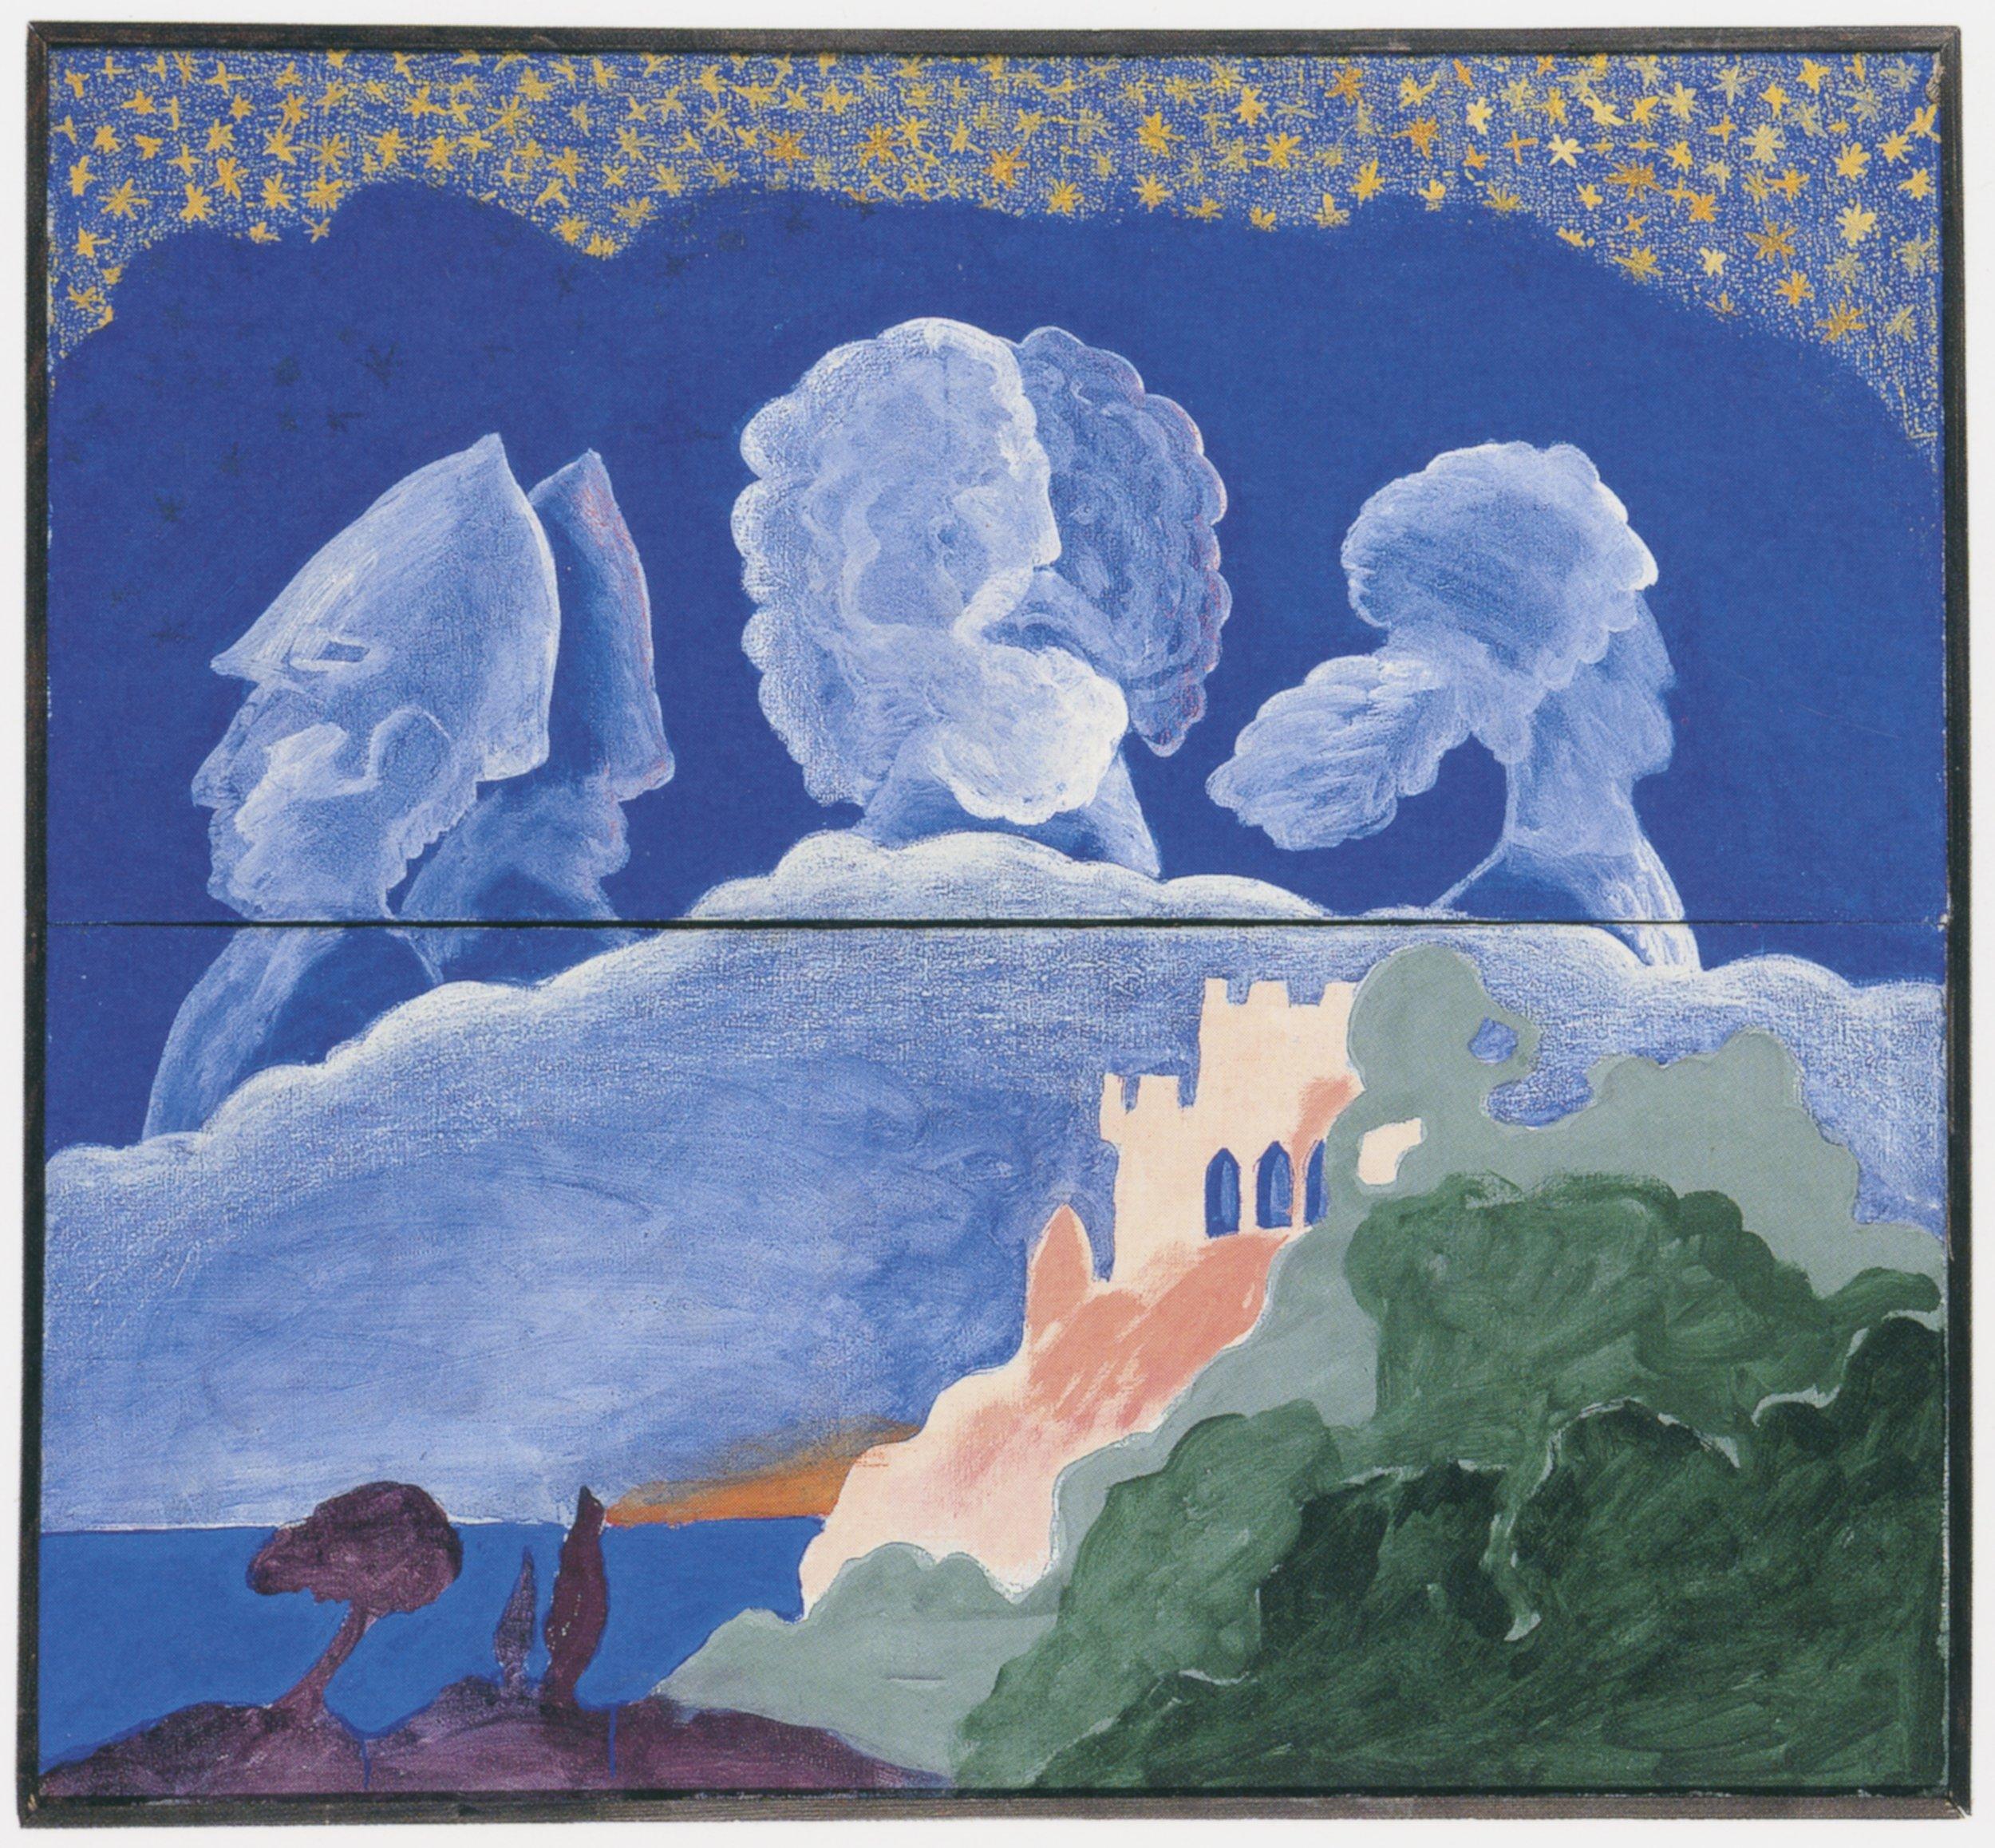 Antikes Miramare , 1968, Resin and oil pastels on canvas in two-parts, 47.24h x 51.18w in (120h x 130w cm), Museum der Moderne, Salzburg